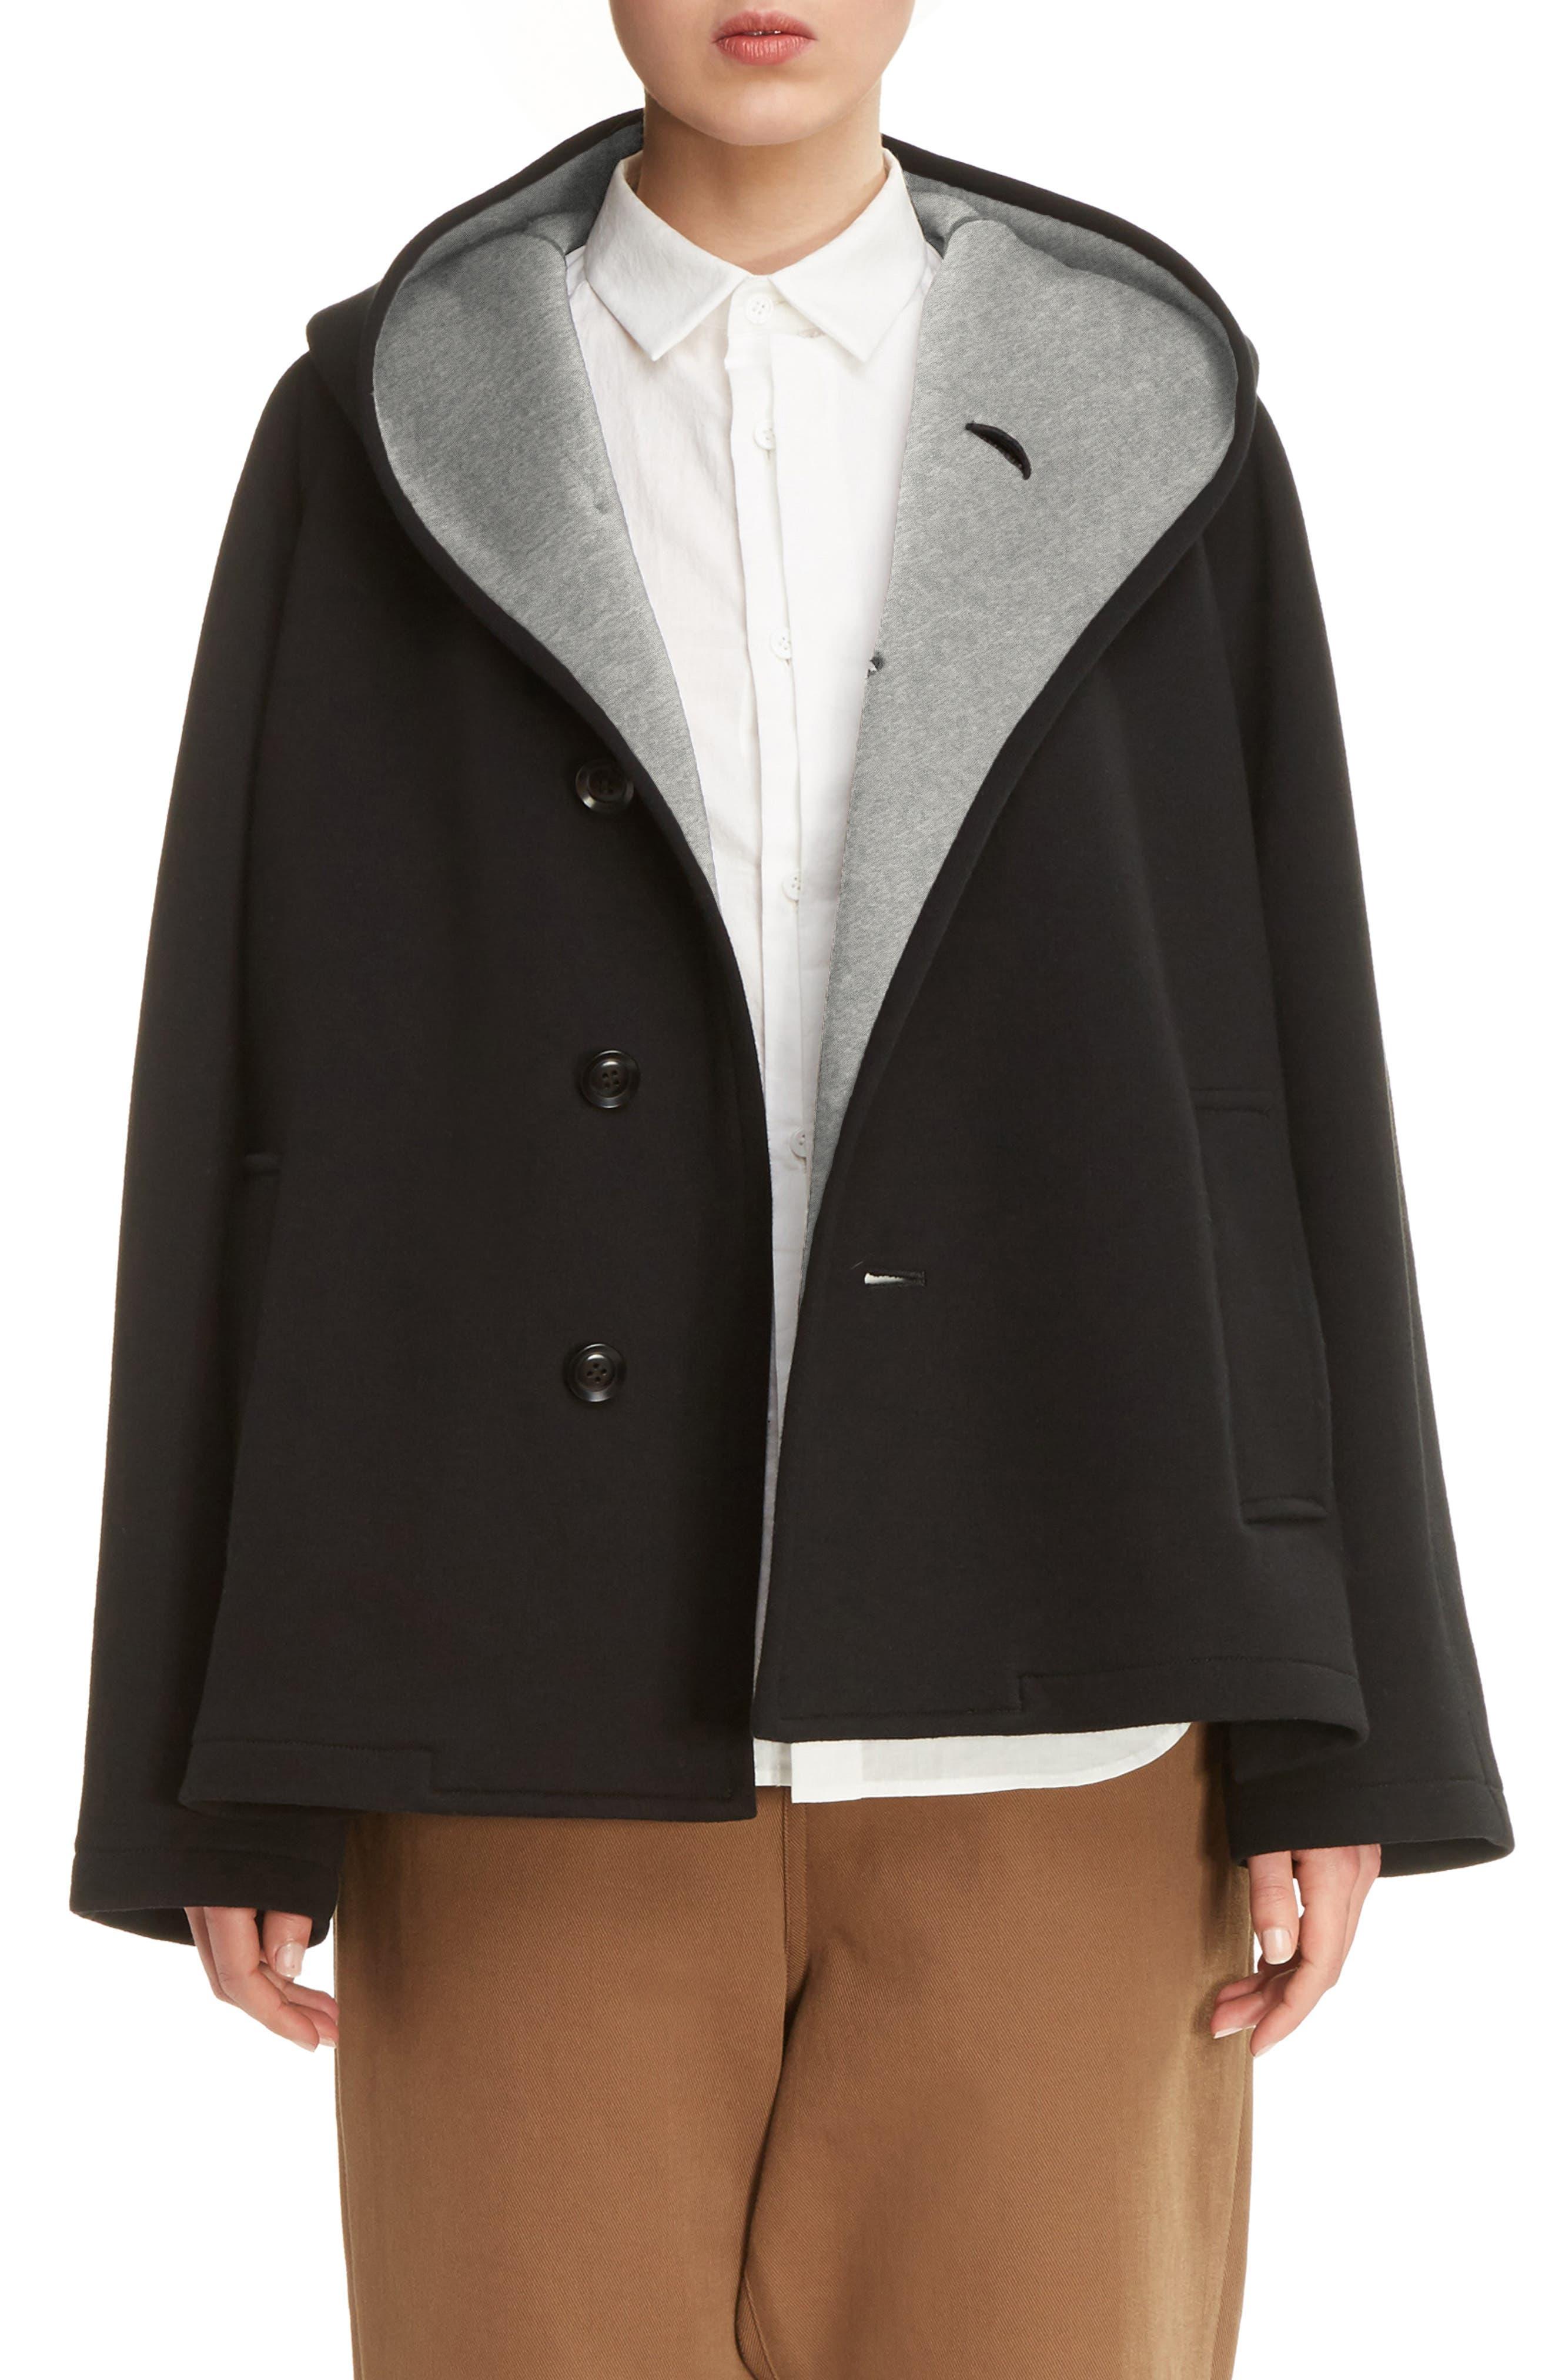 U-Hood Short Jacket,                         Main,                         color, 020